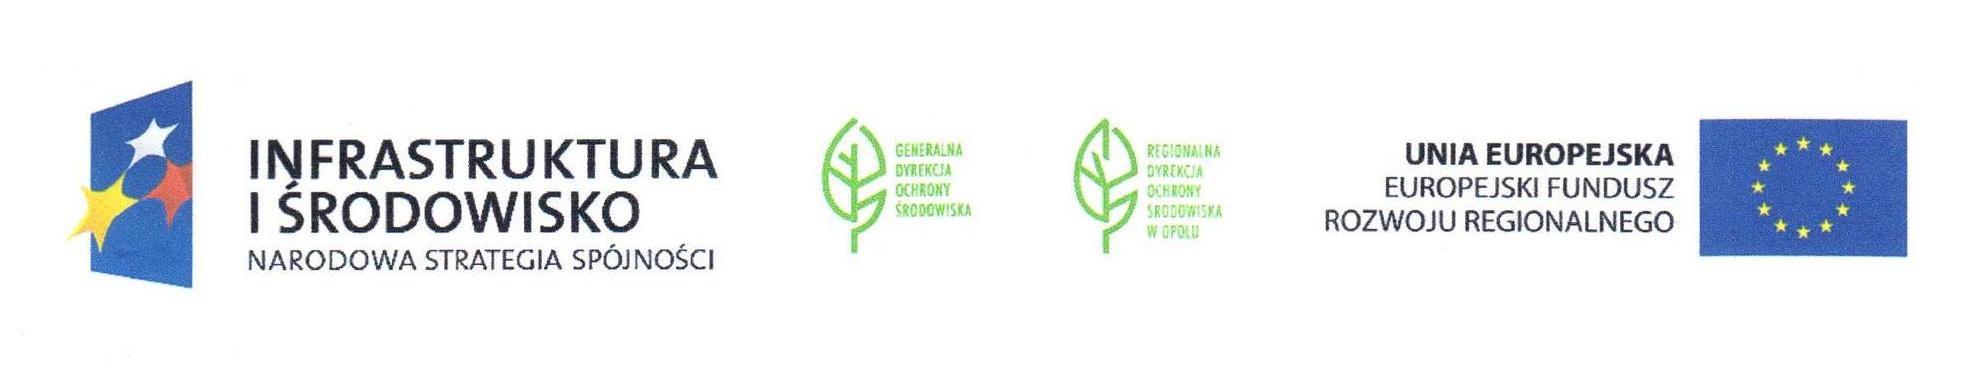 natura_2000_logo.jpeg